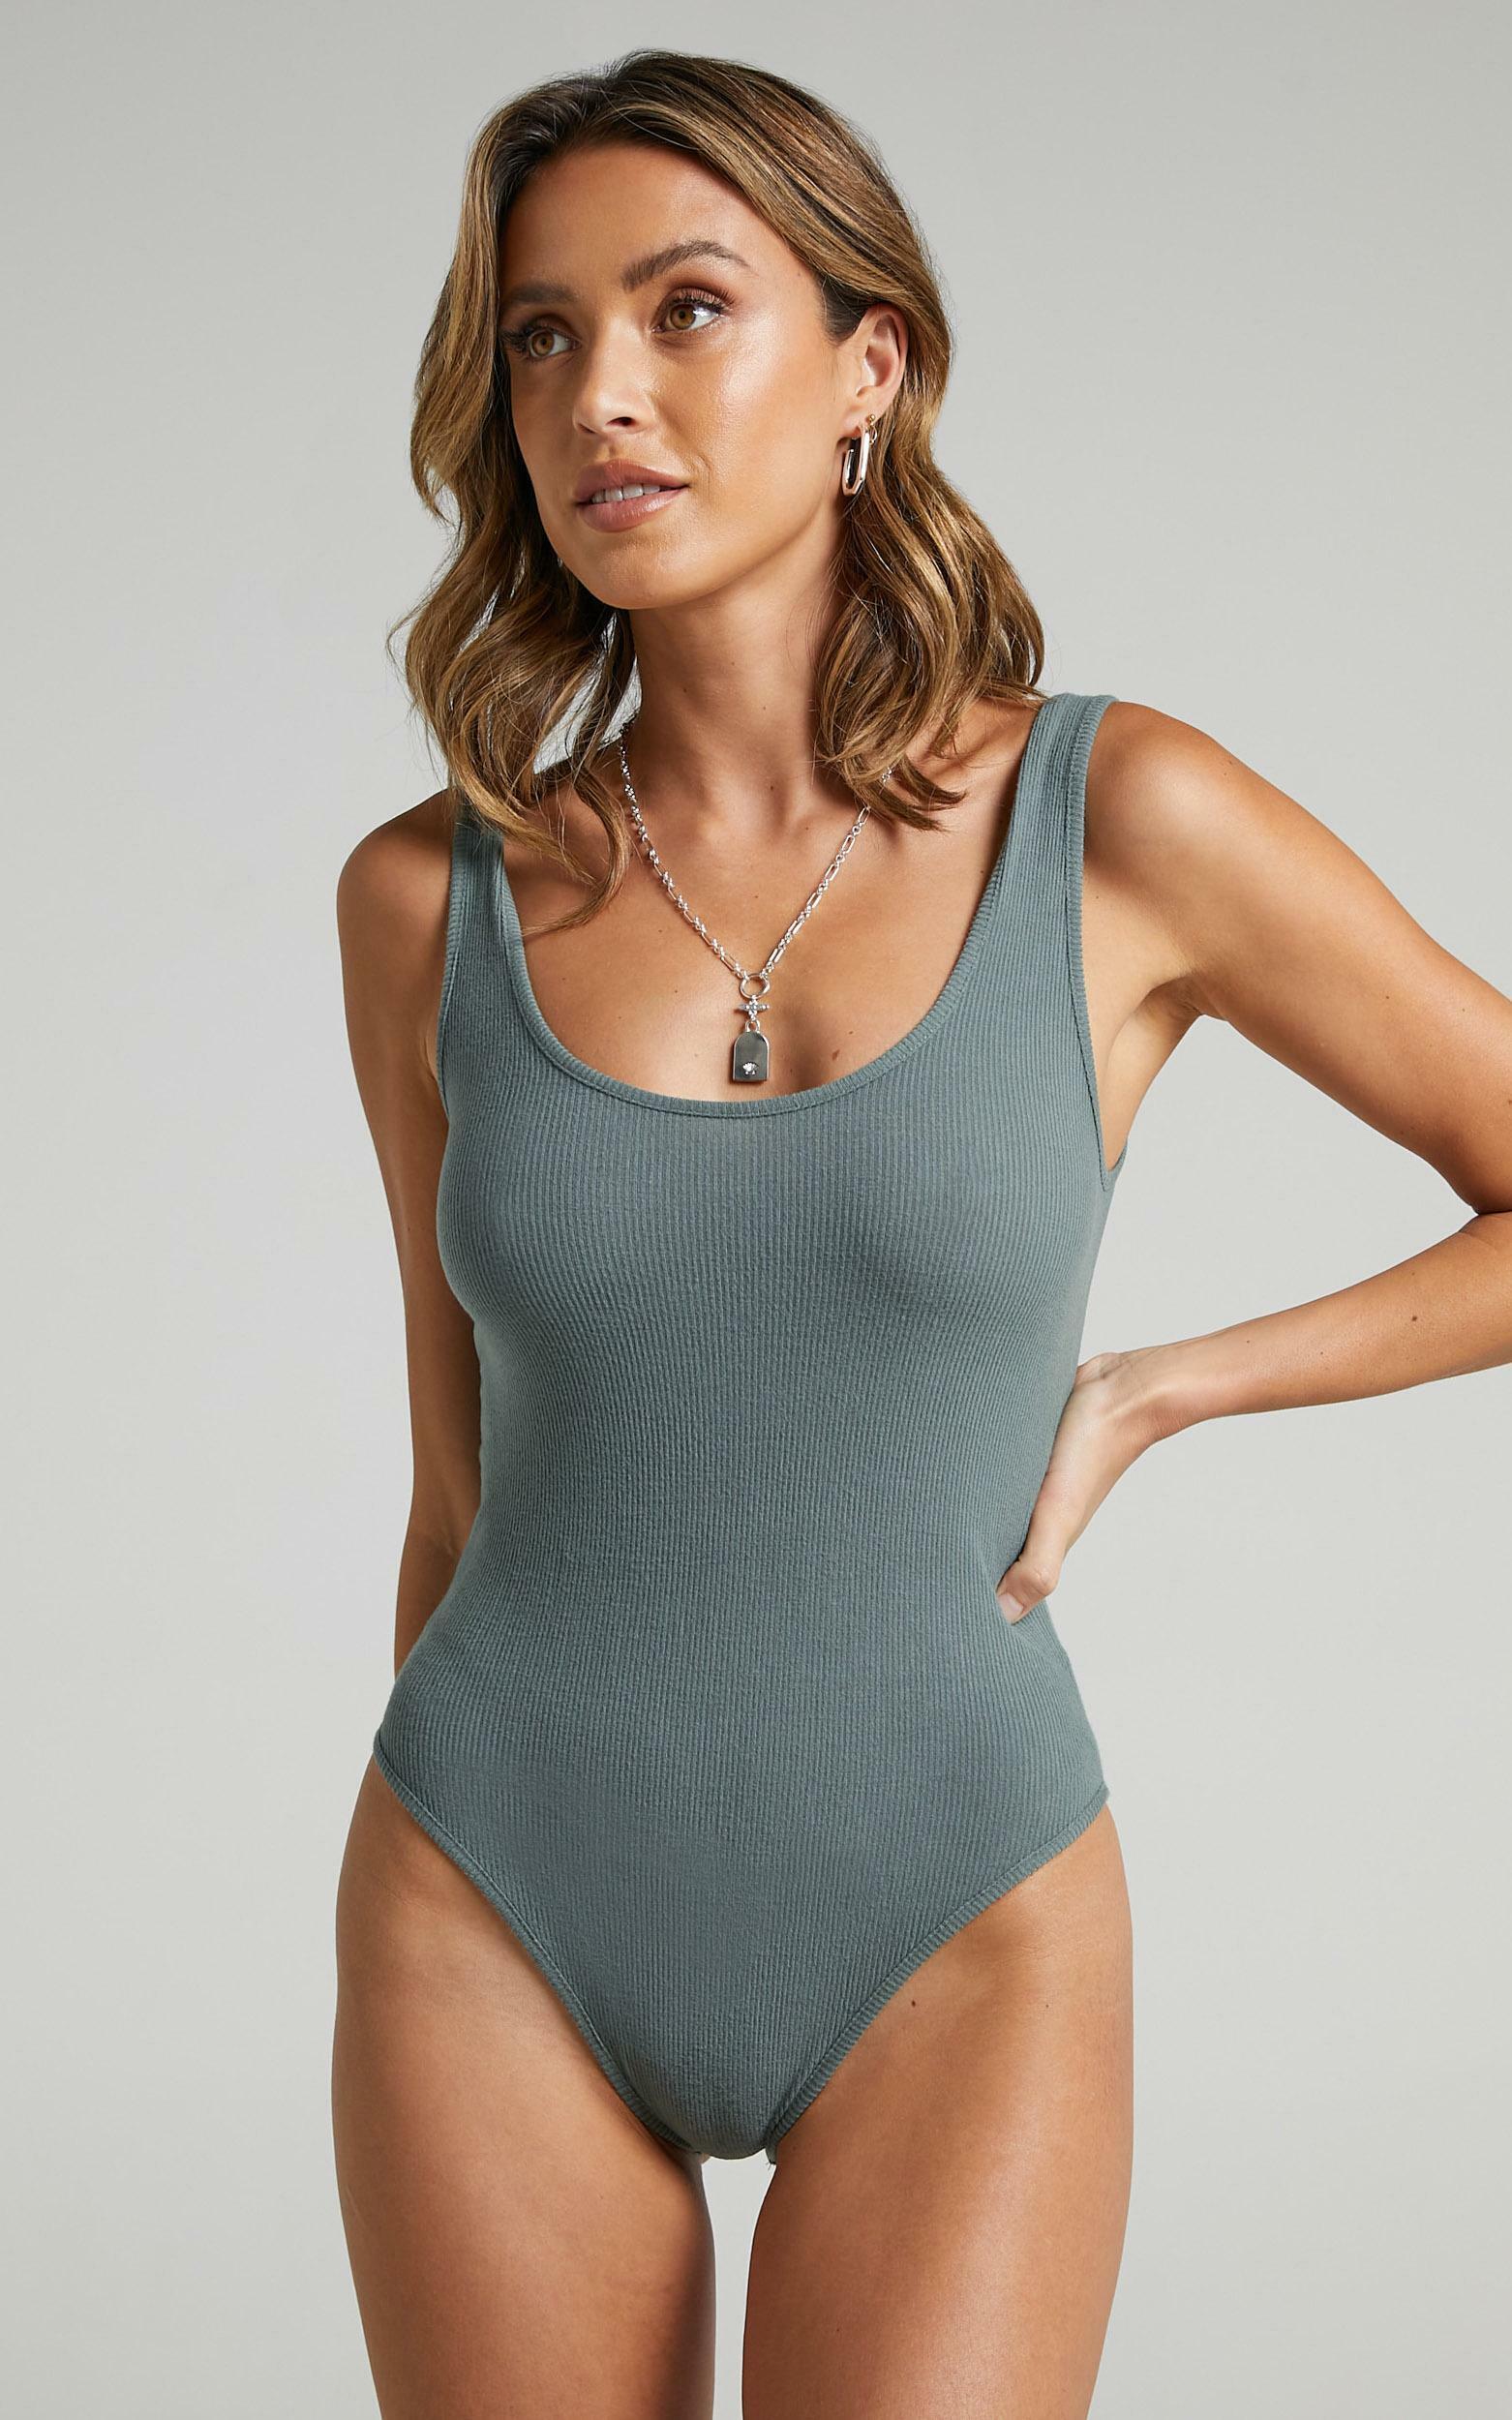 Pearce Bodysuit in Khaki - 12, GRN1, hi-res image number null